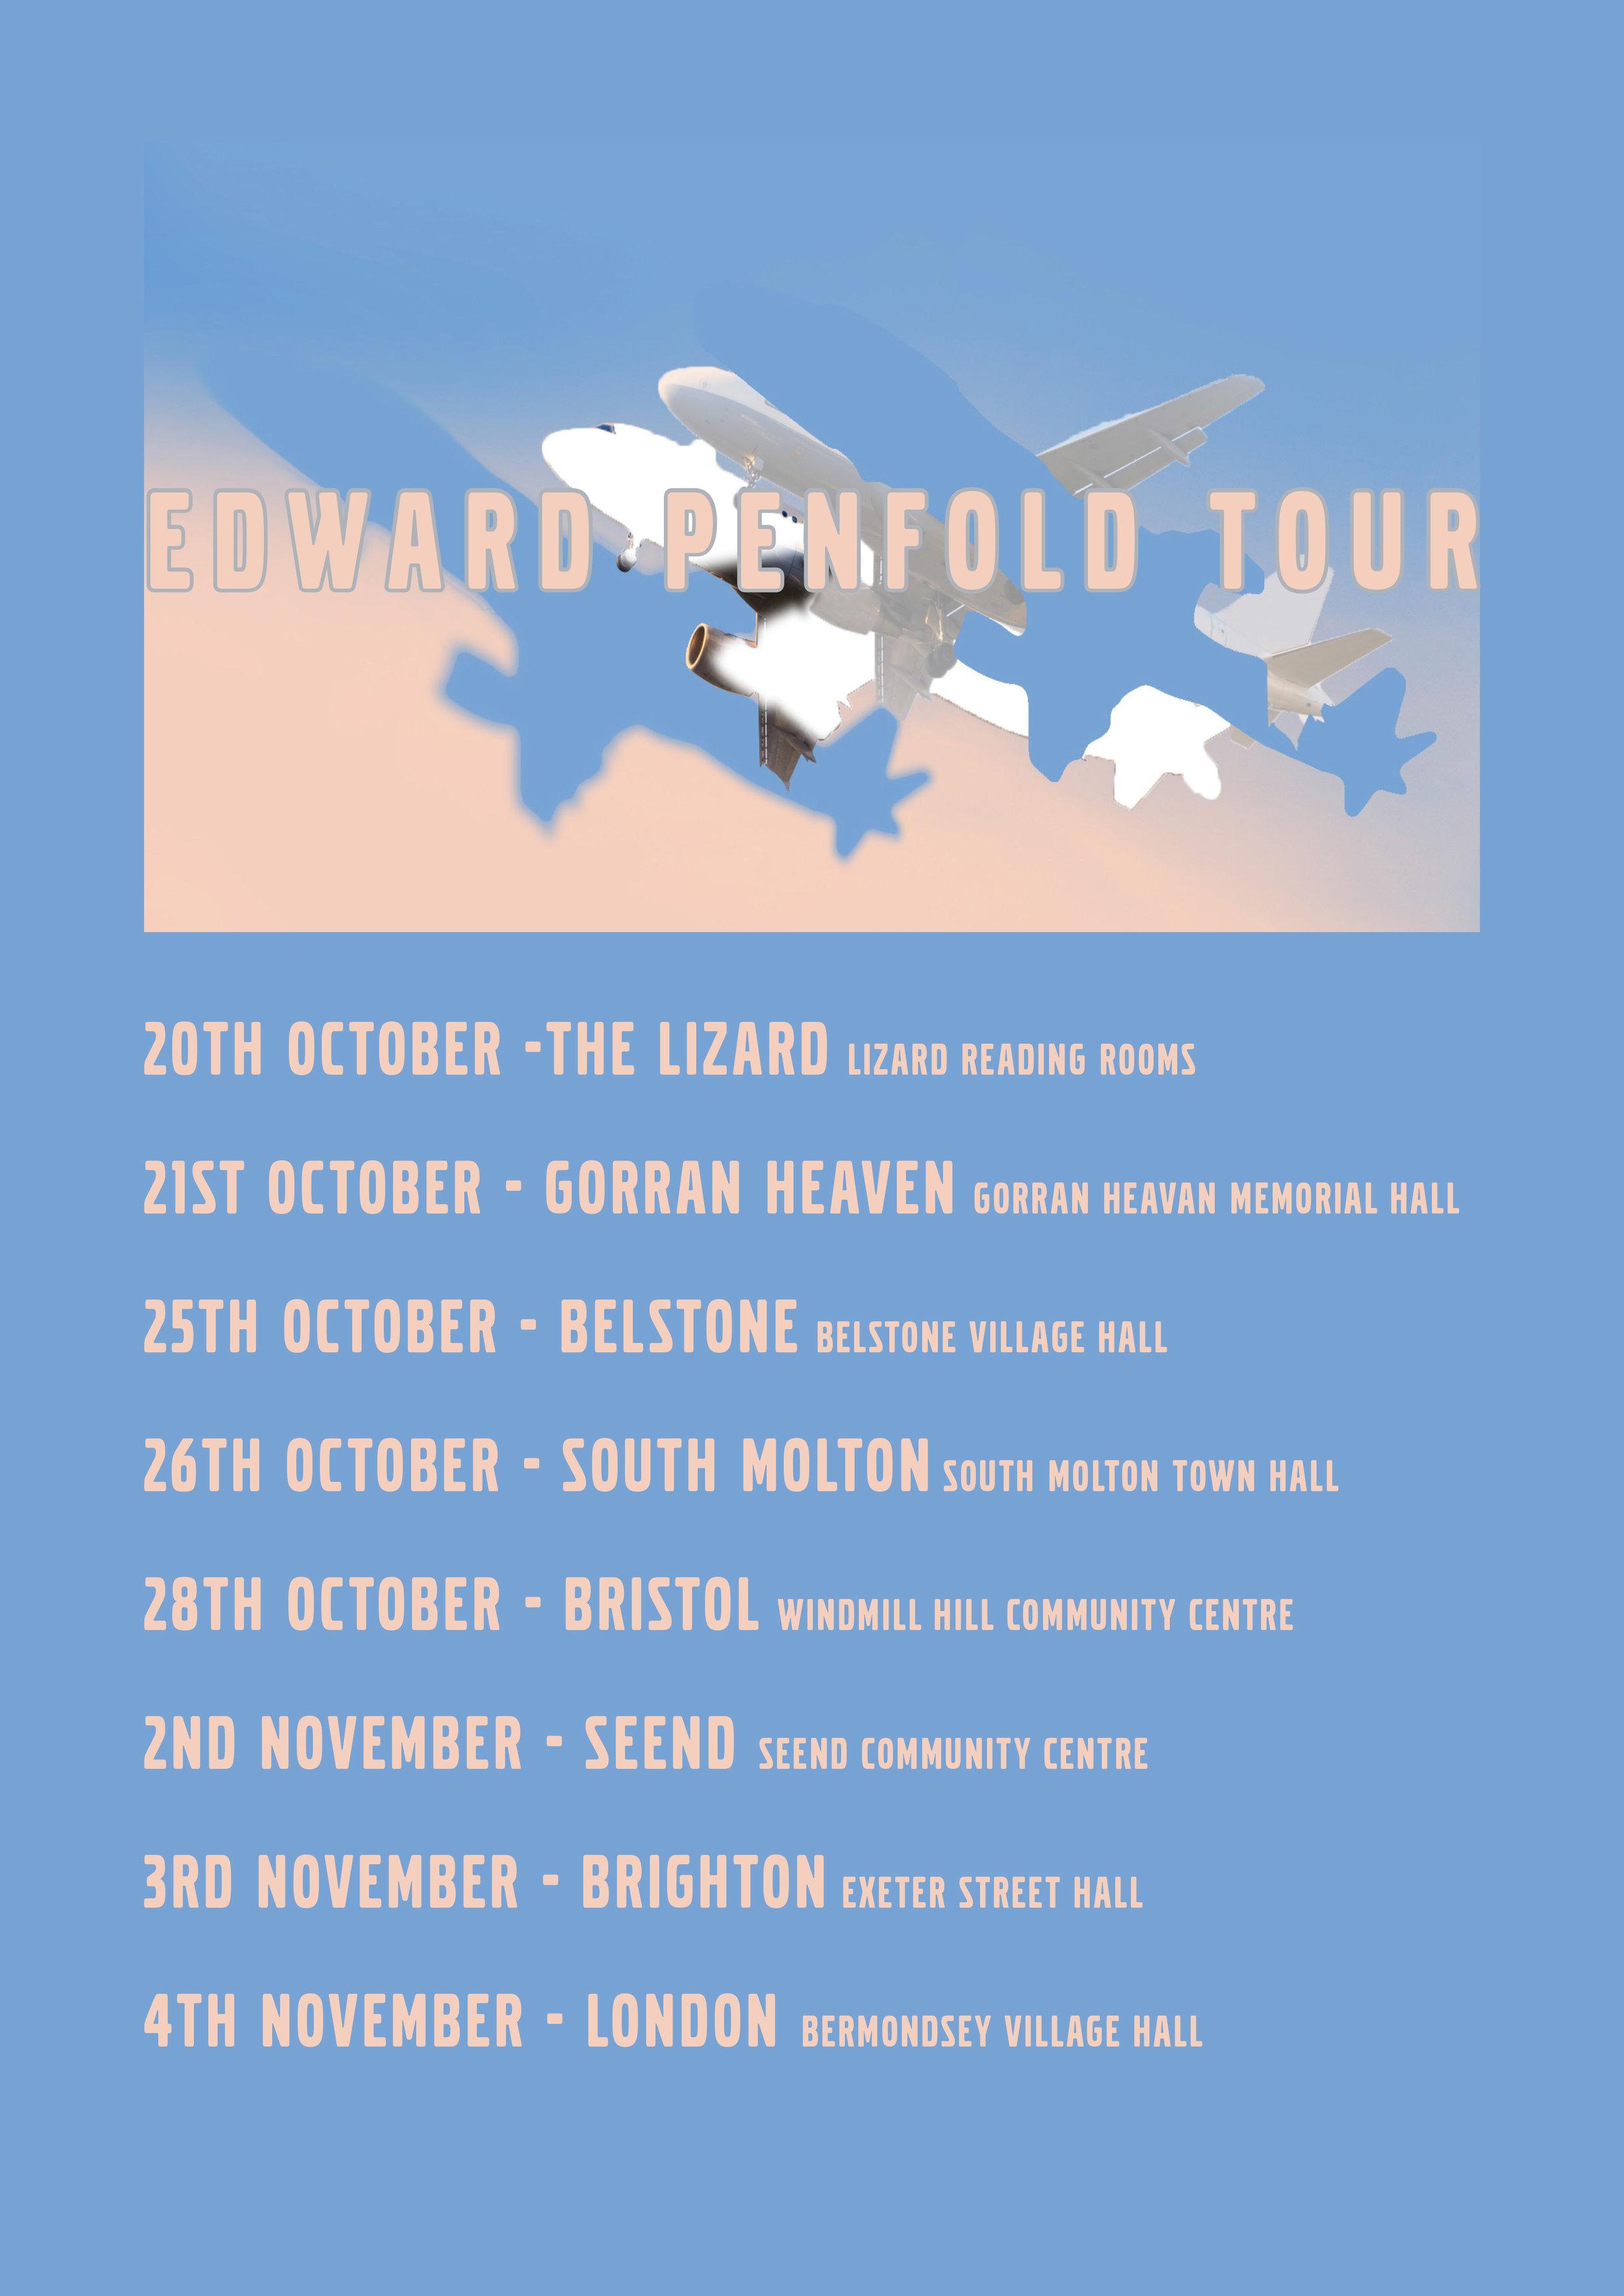 Edward Penfold - Tour